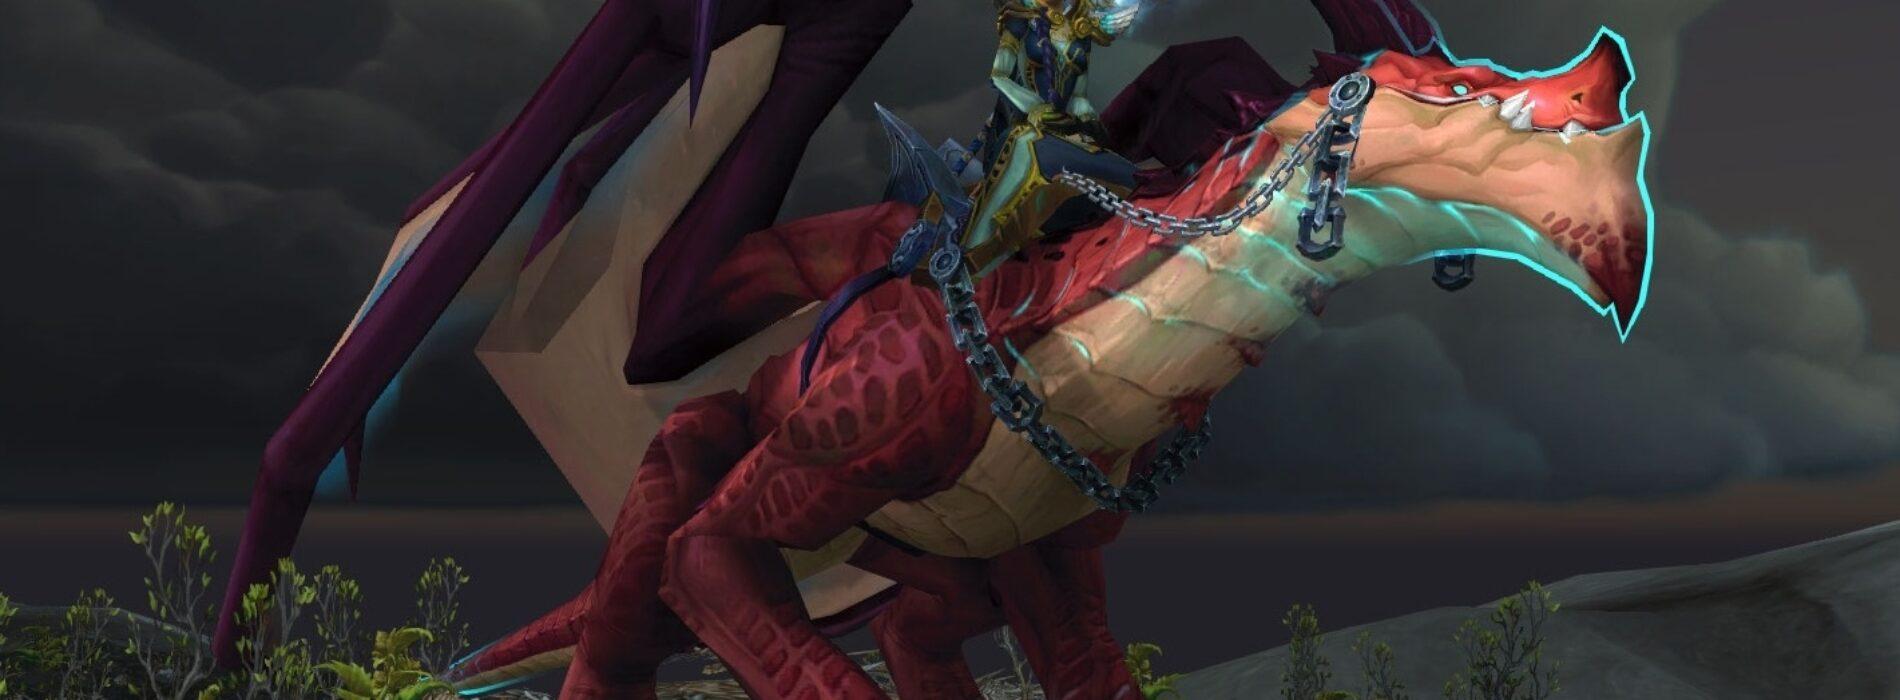 World of Warcraft Valarjar Stormwing Mount – Poradnik